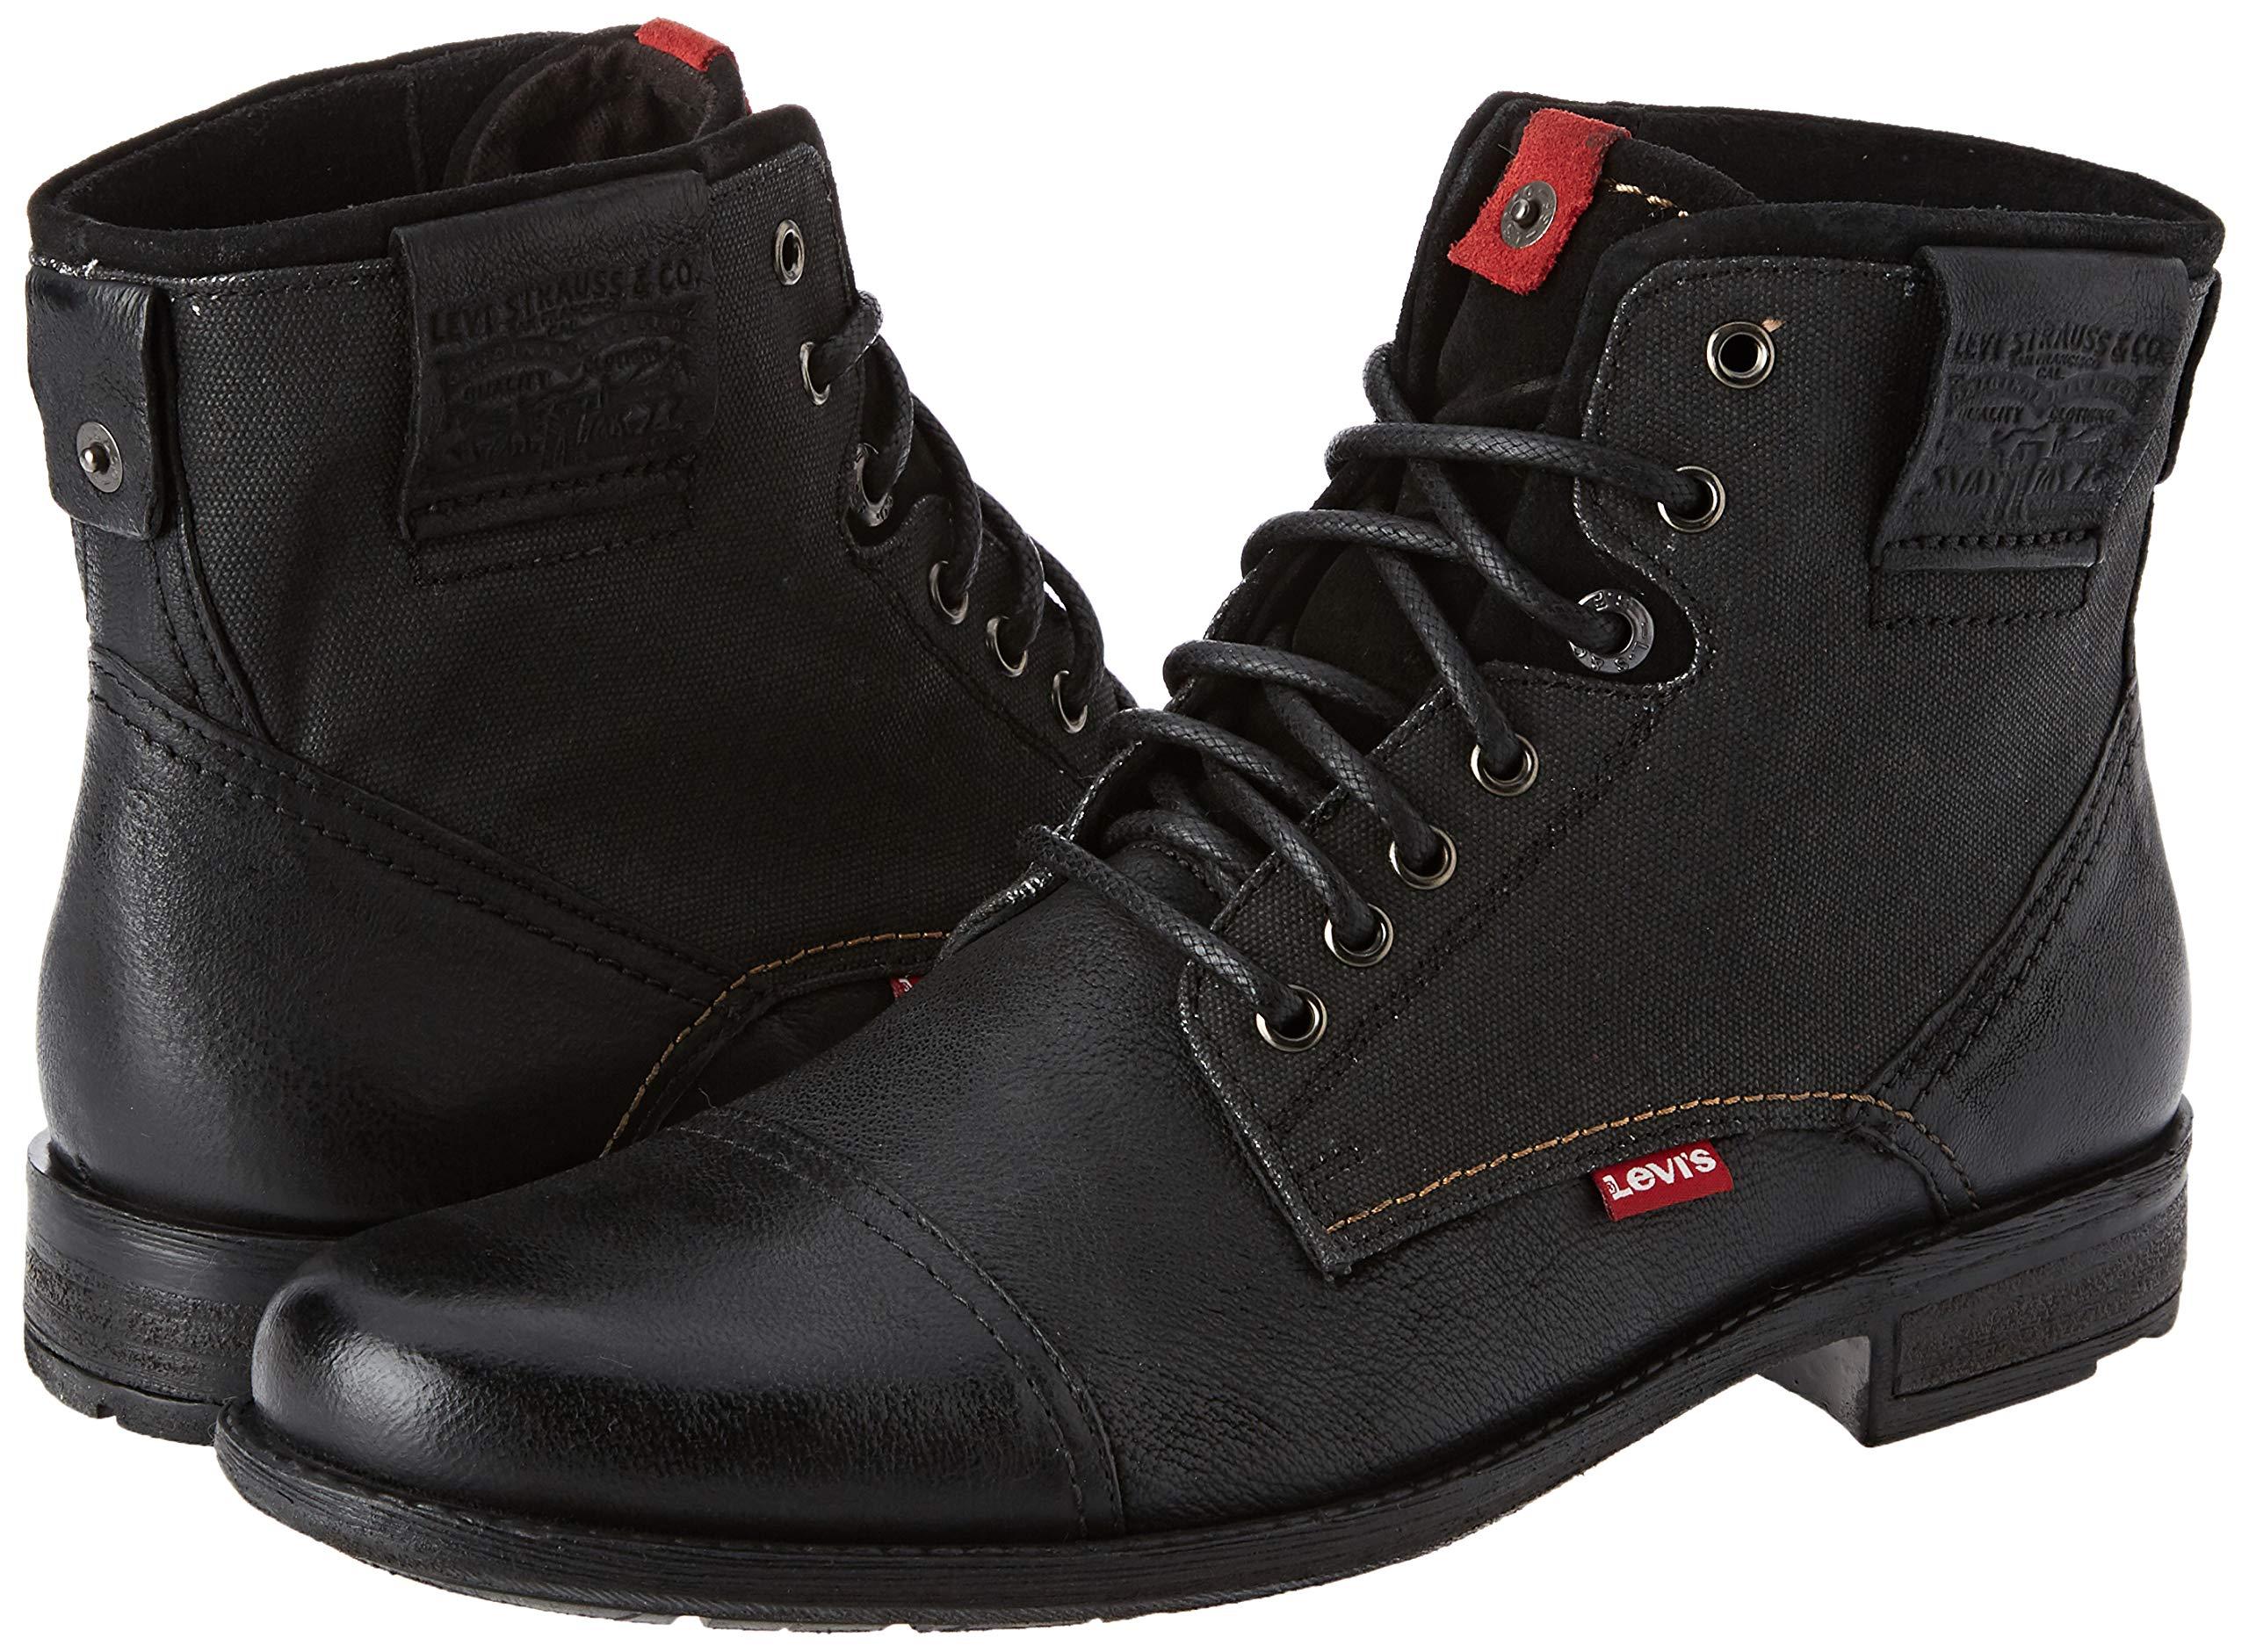 Levi's Men's Fowler Biker Boots 5